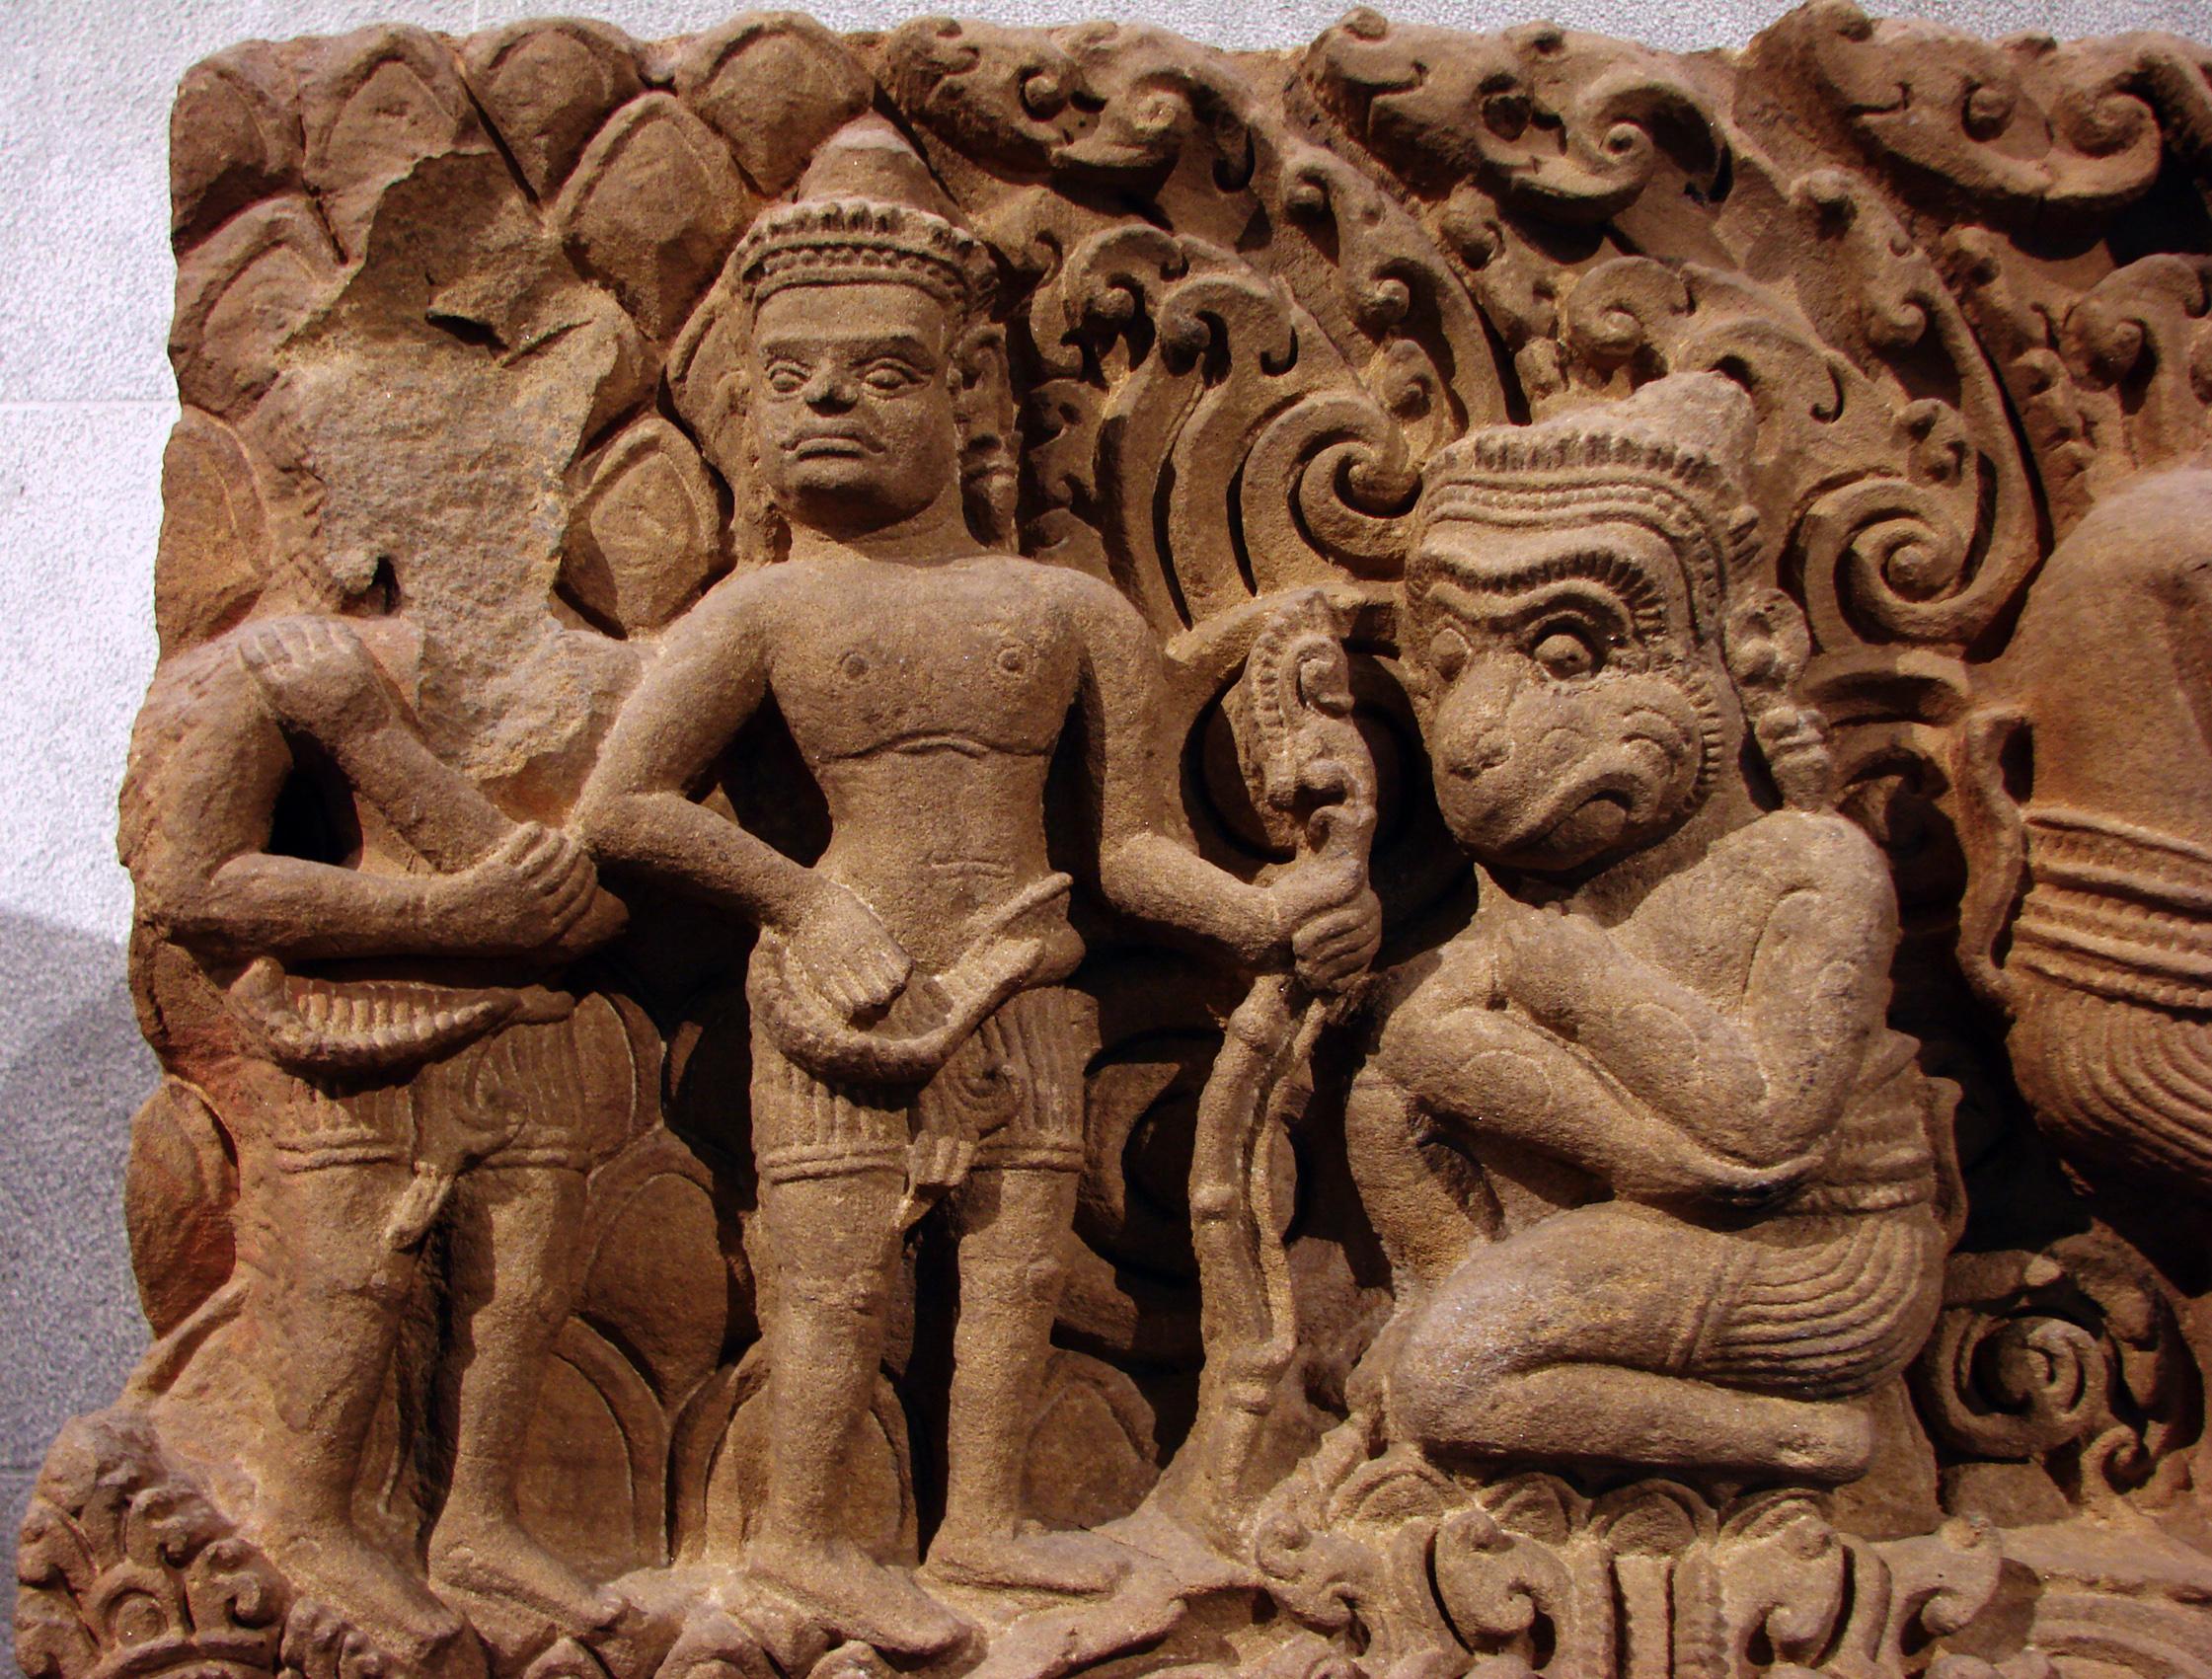 http://upload.wikimedia.org/wikipedia/commons/0/0a/Linteau_Ramayana_Mus%C3%A9e_Guimet_9971.jpg